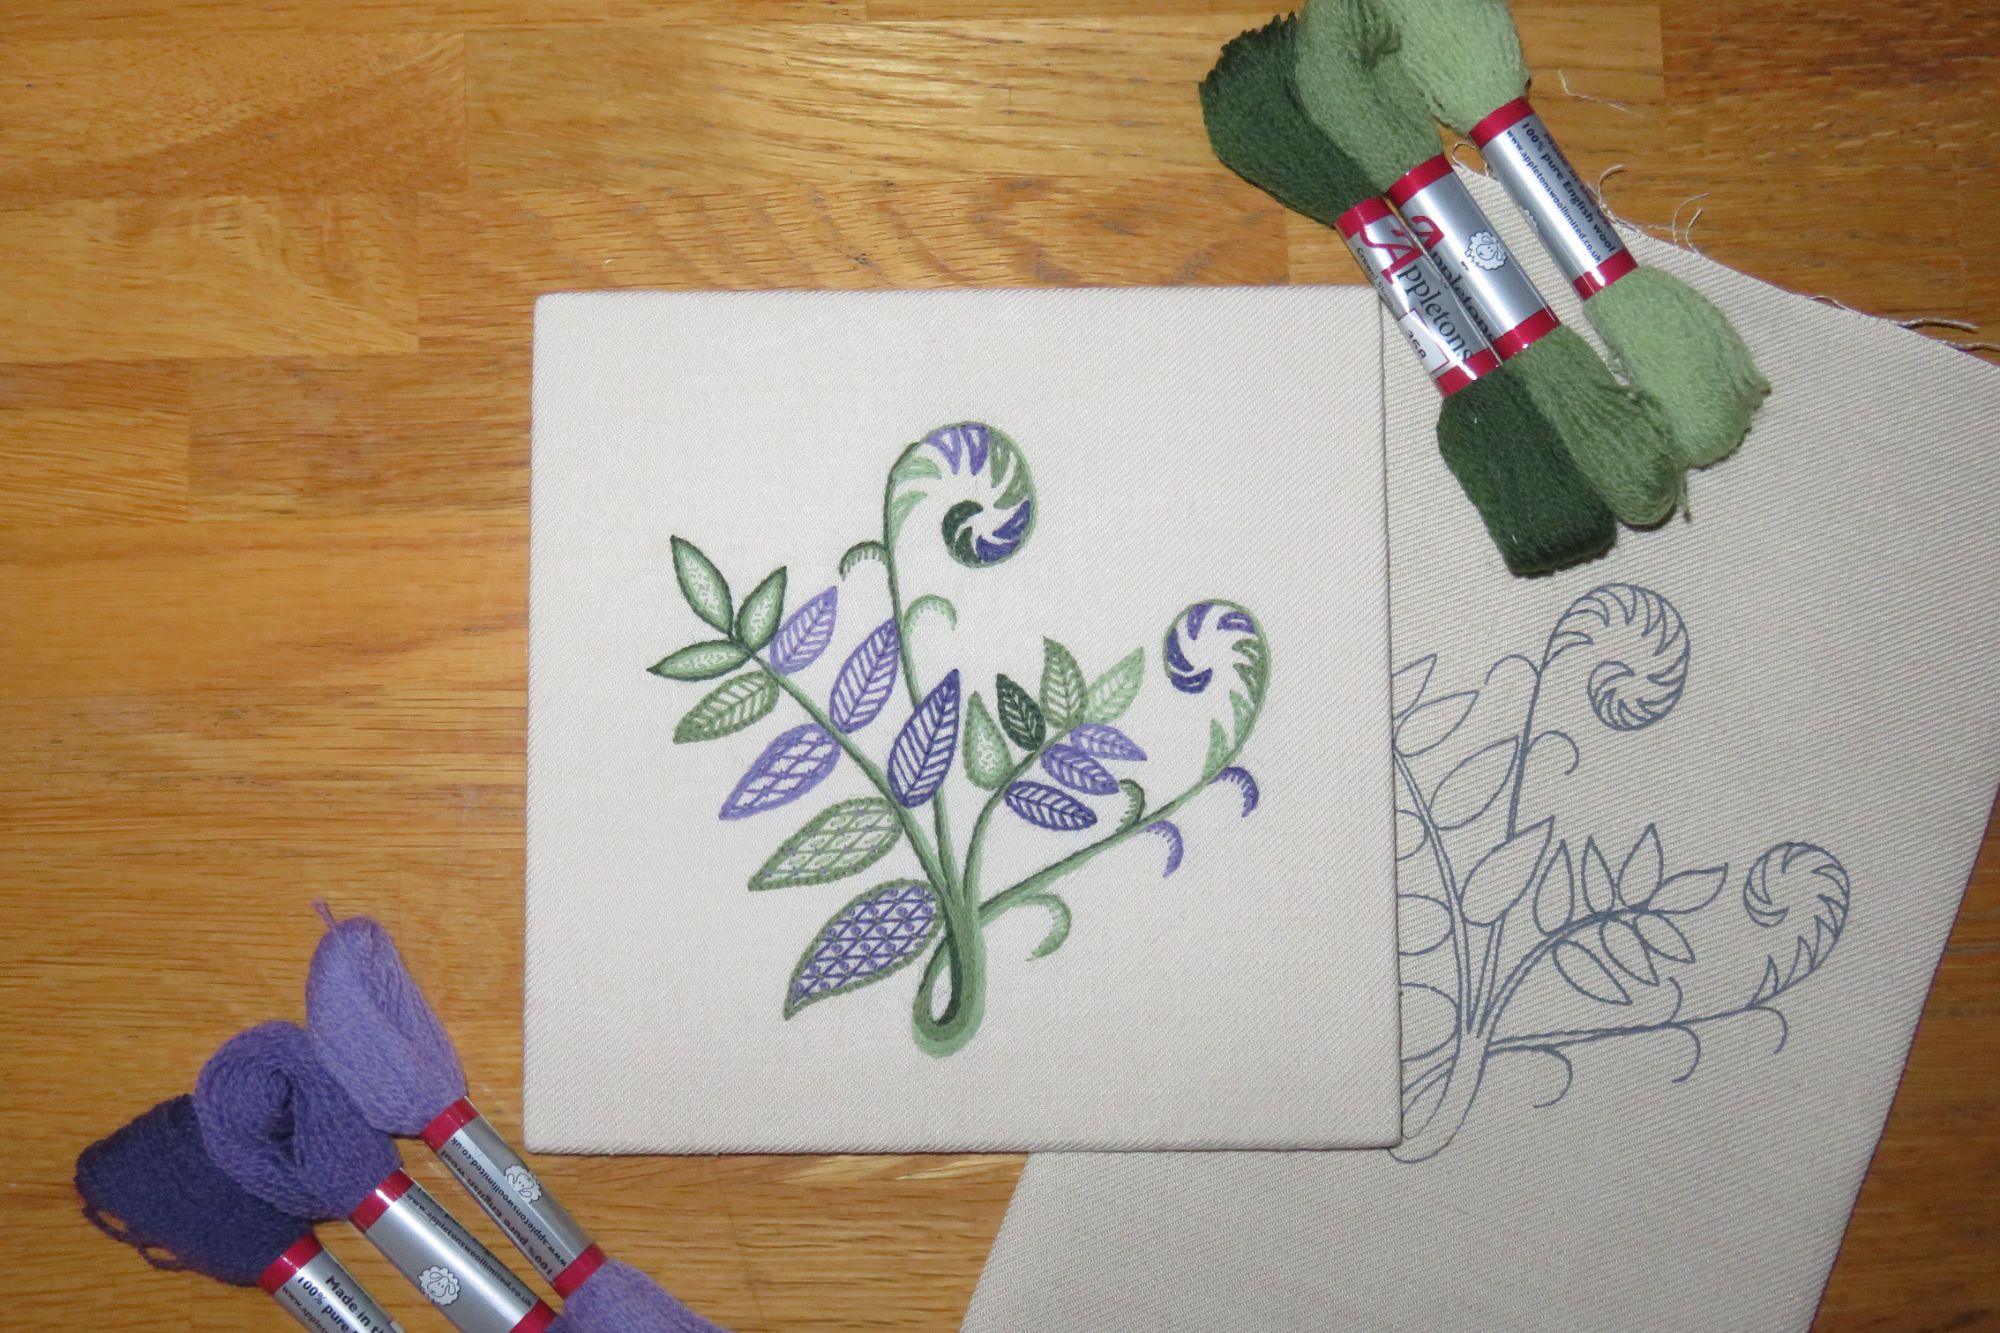 spring-fern-embroidery-kit-quiltdragonkits.jpg